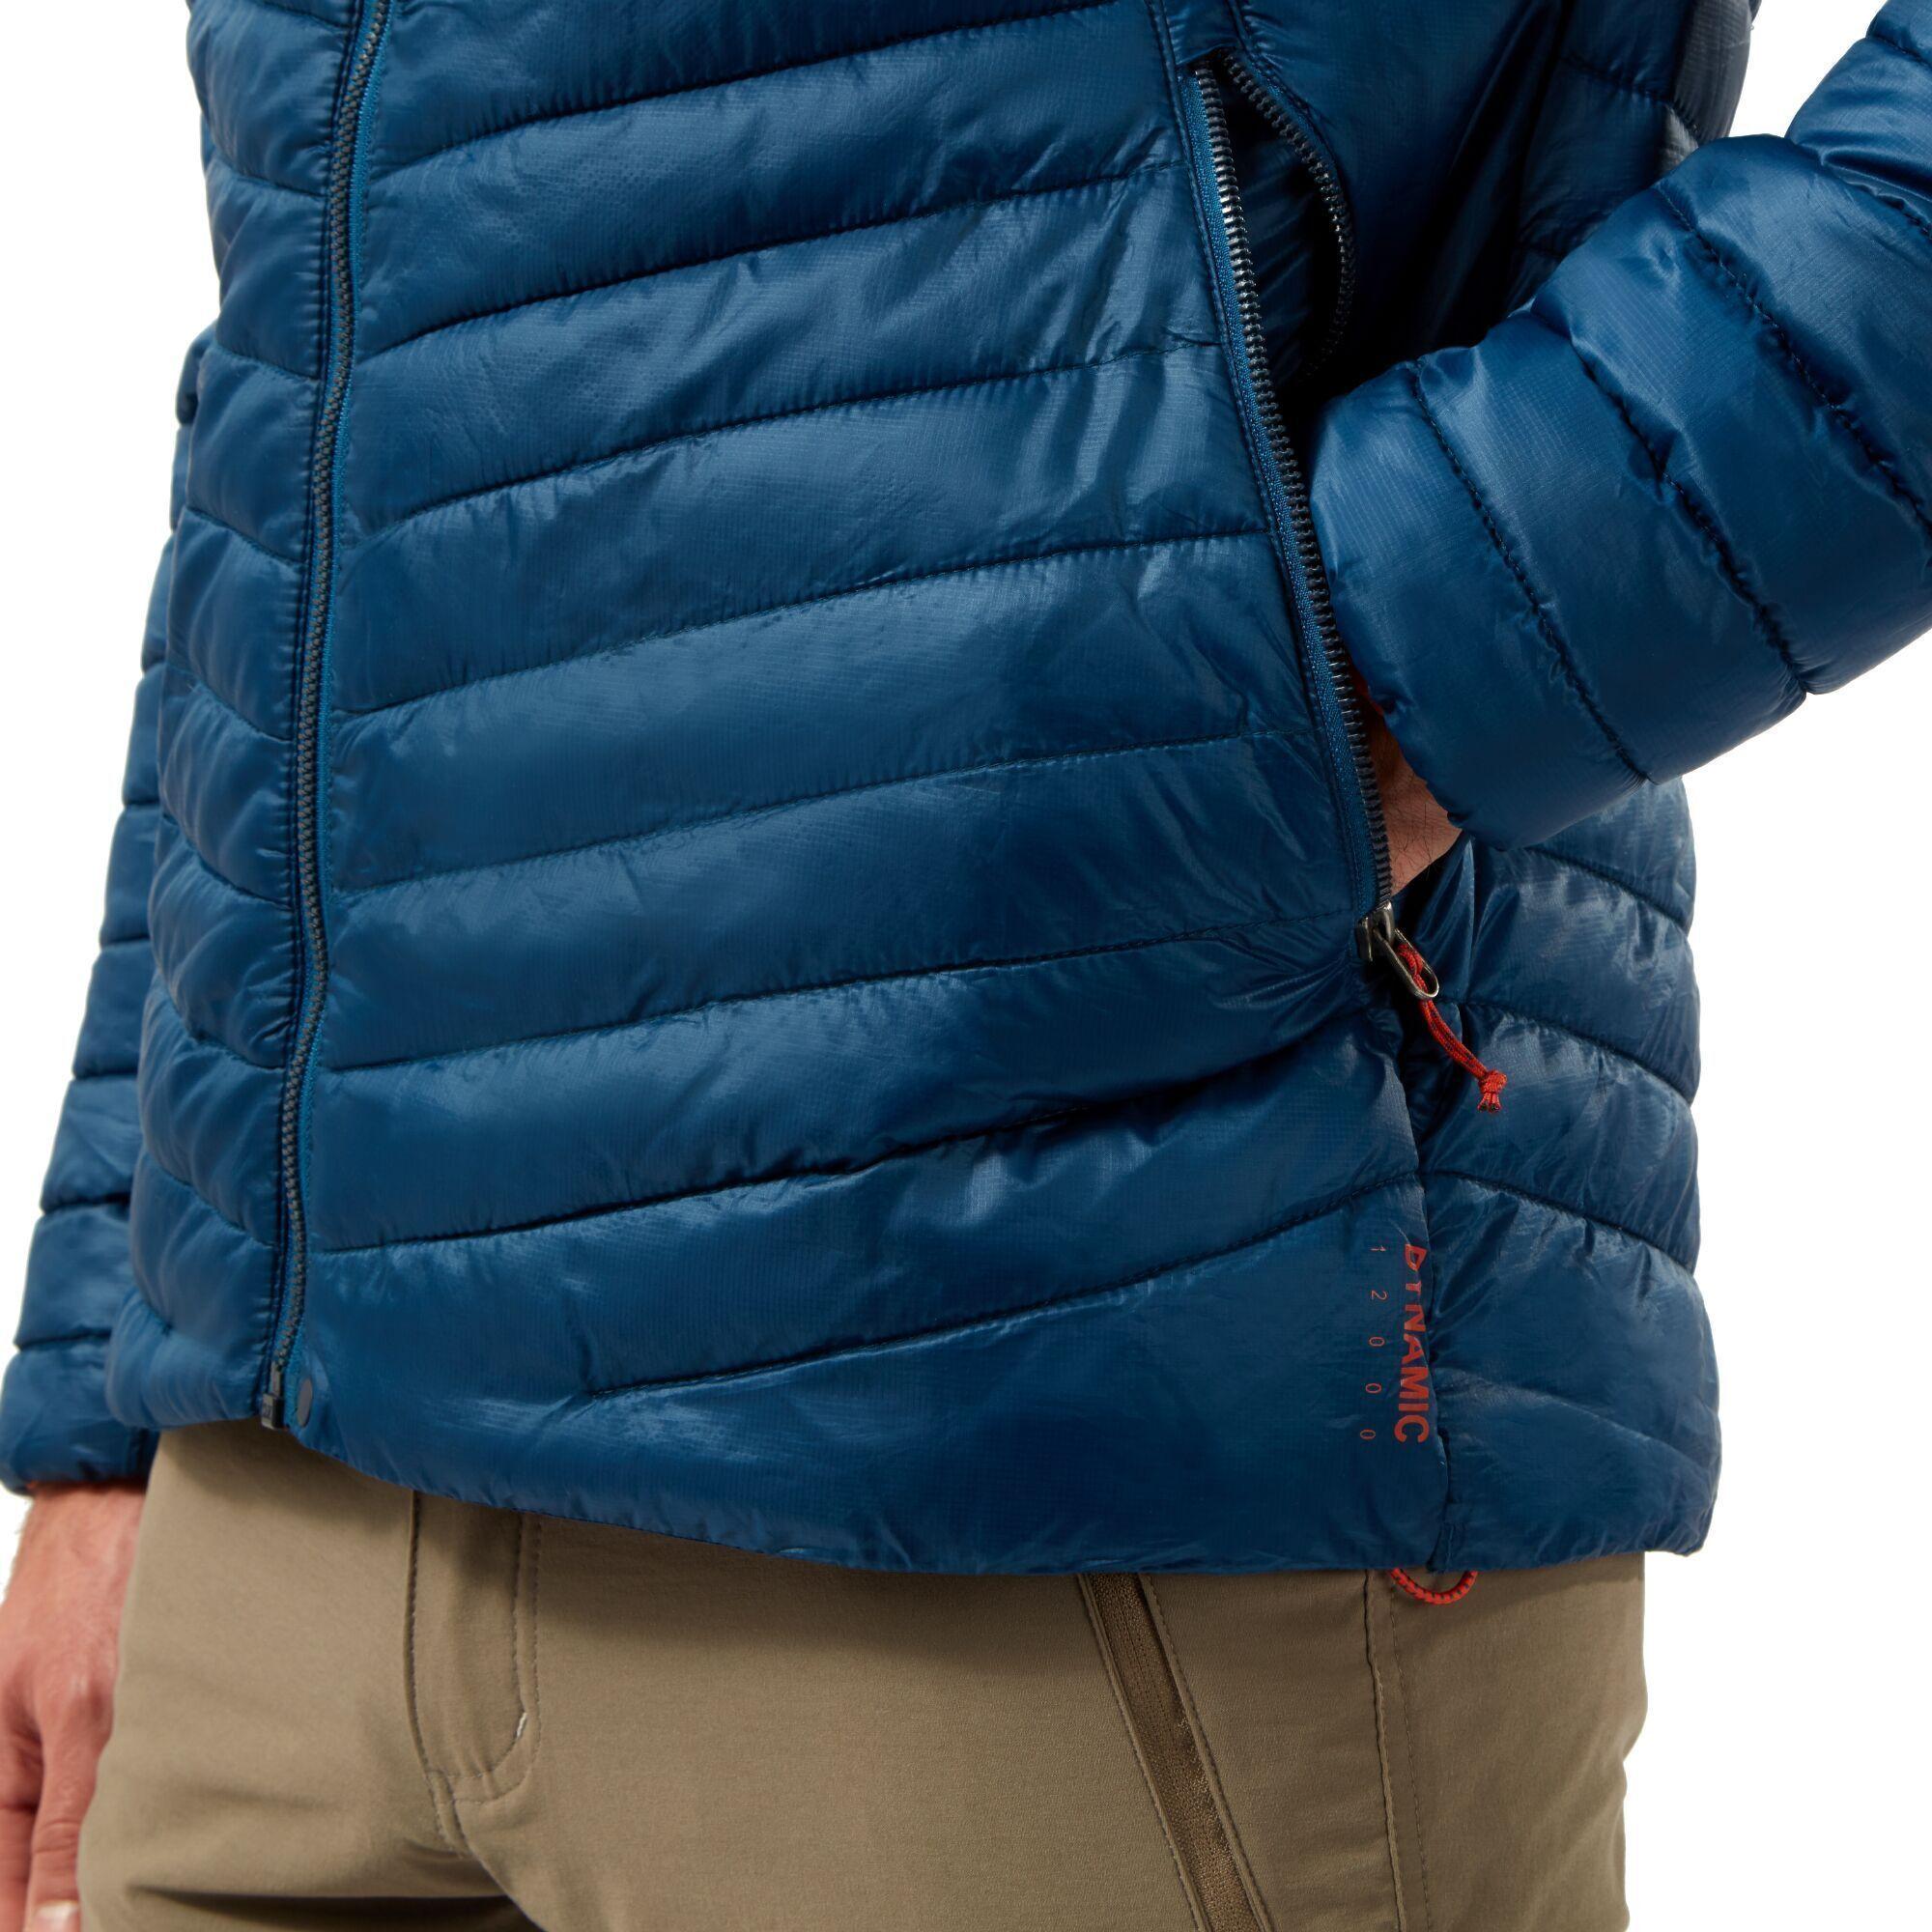 Craghoppers Mens Expolite Padded Jacket (Poseidon Blue)